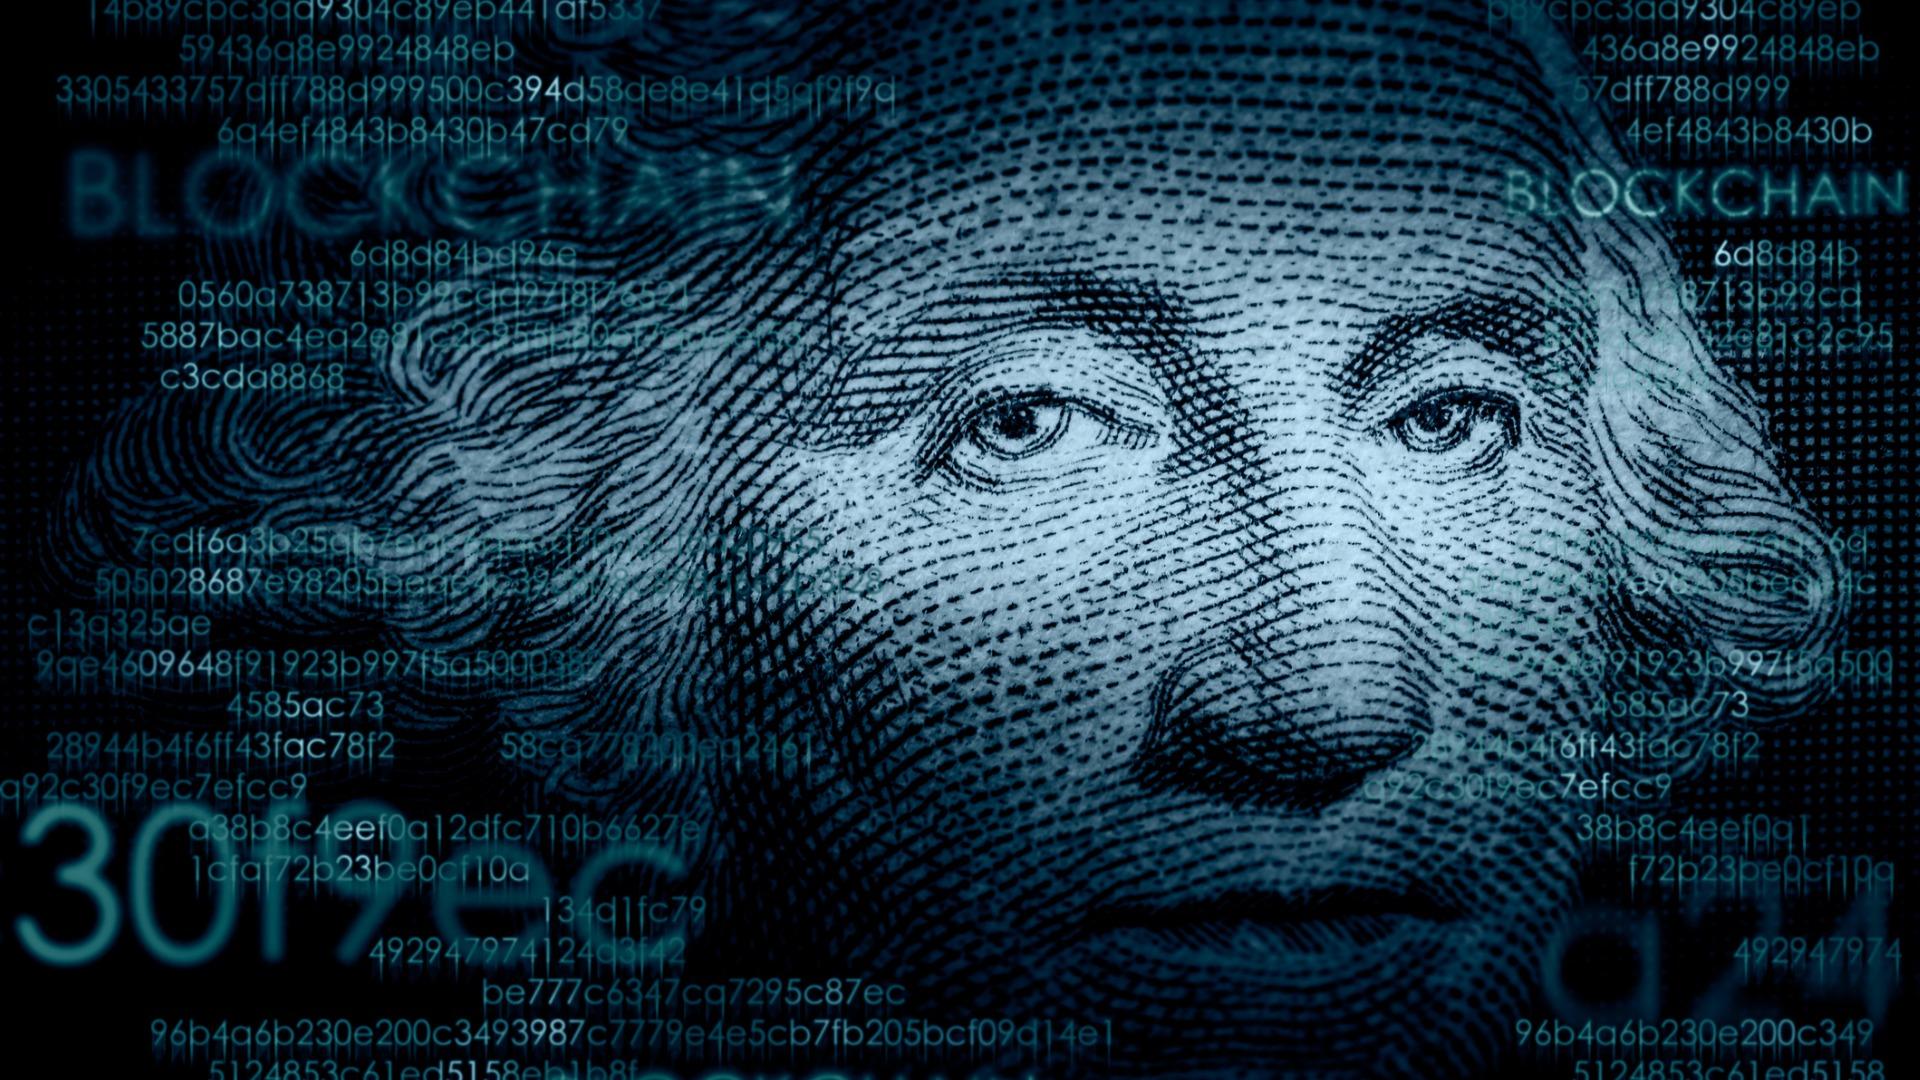 George Washington on dollar bill with blockchain code